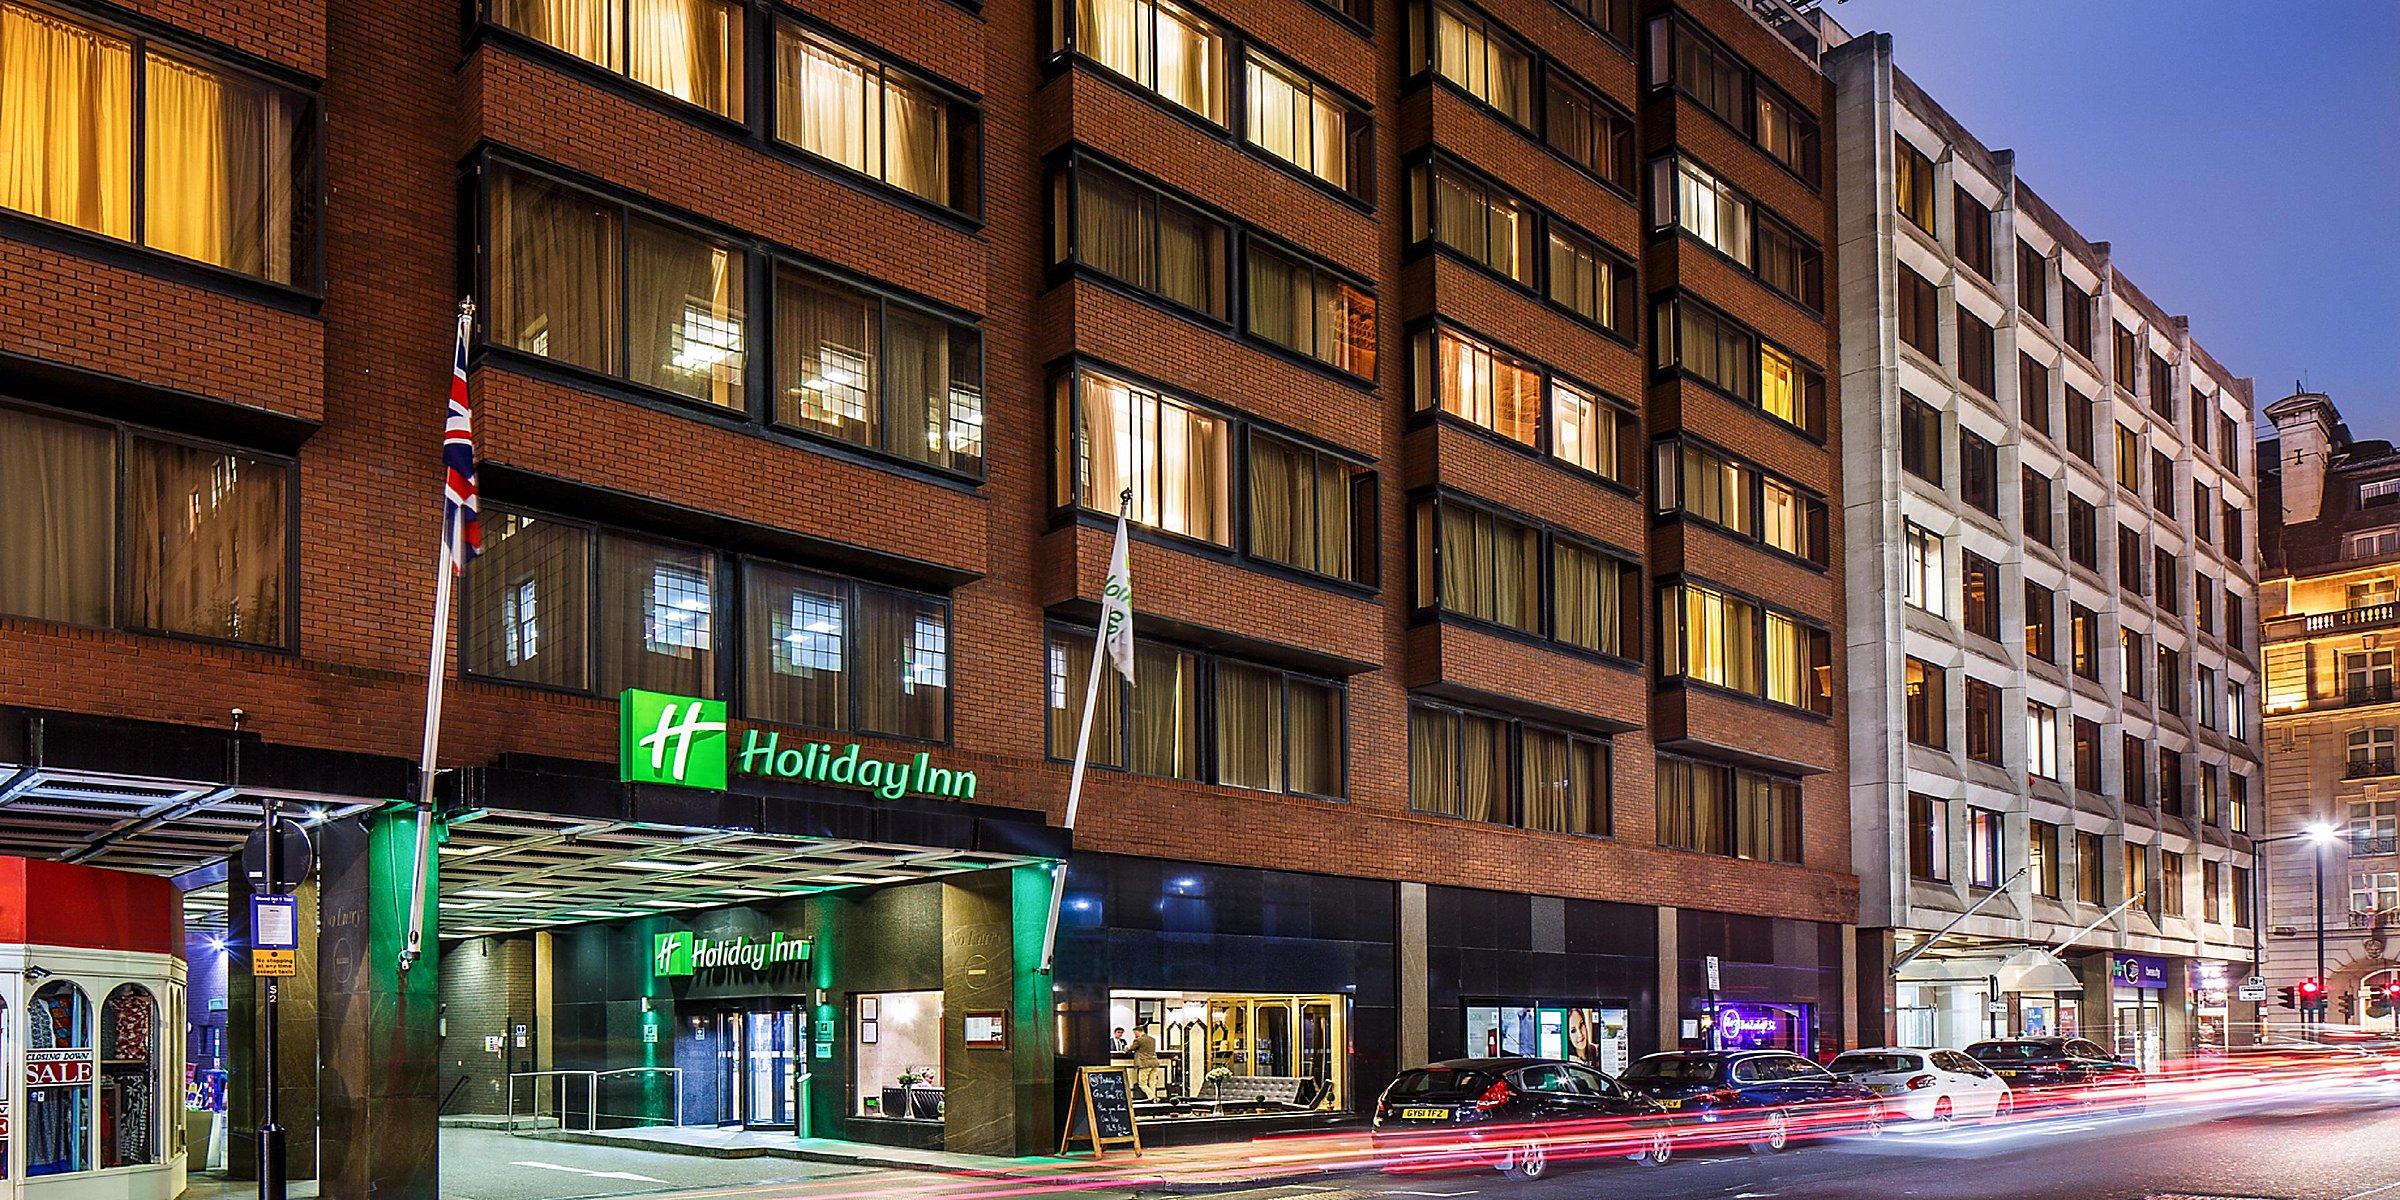 Mayfair Hotels near Green Park, London | Holiday Inn London